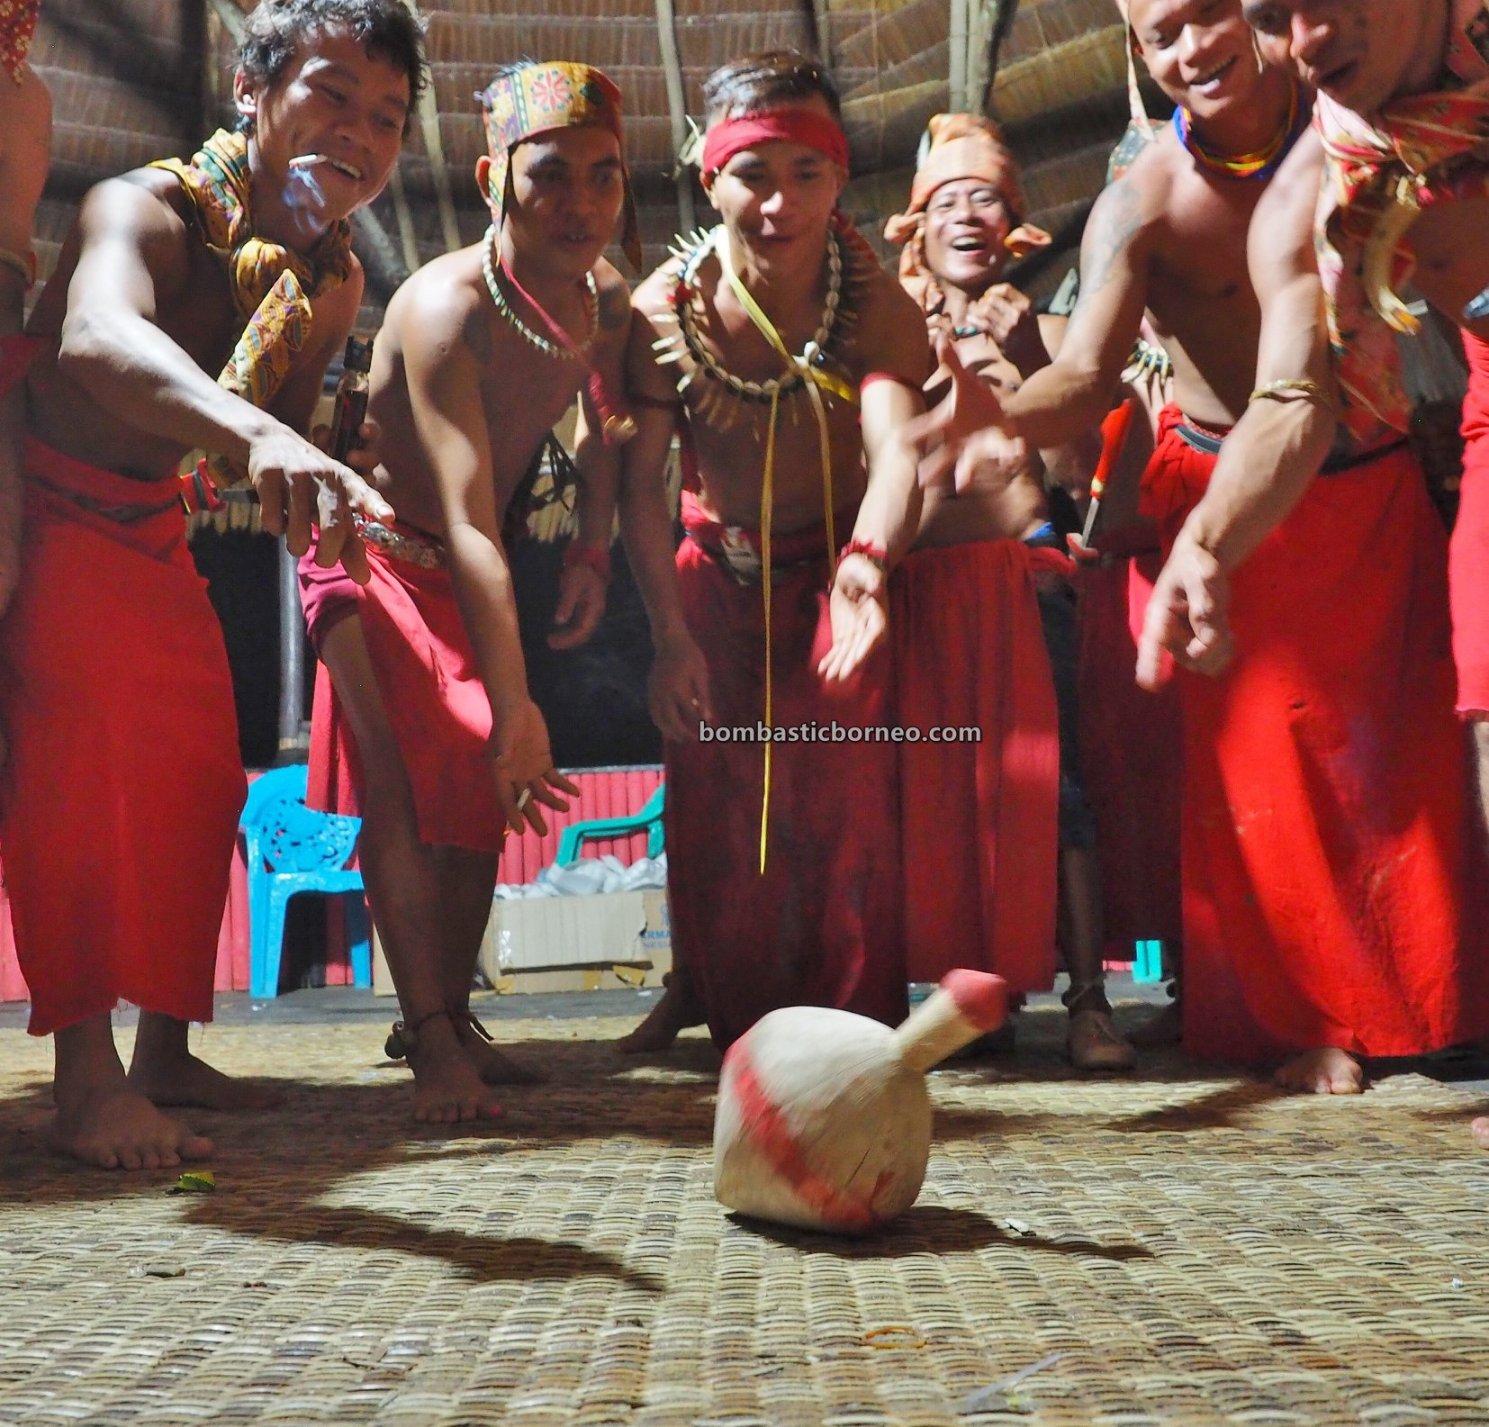 Paddy Harvest Festival, destination, Kalimantan Barat, Desa Hli Buei, authentic, event, native, tribe, Tourism, tourist attraction, travel guide, Trans Borneo, 探索婆罗洲传统文化, 达雅克丰收节日, 西加里曼丹旅游景点